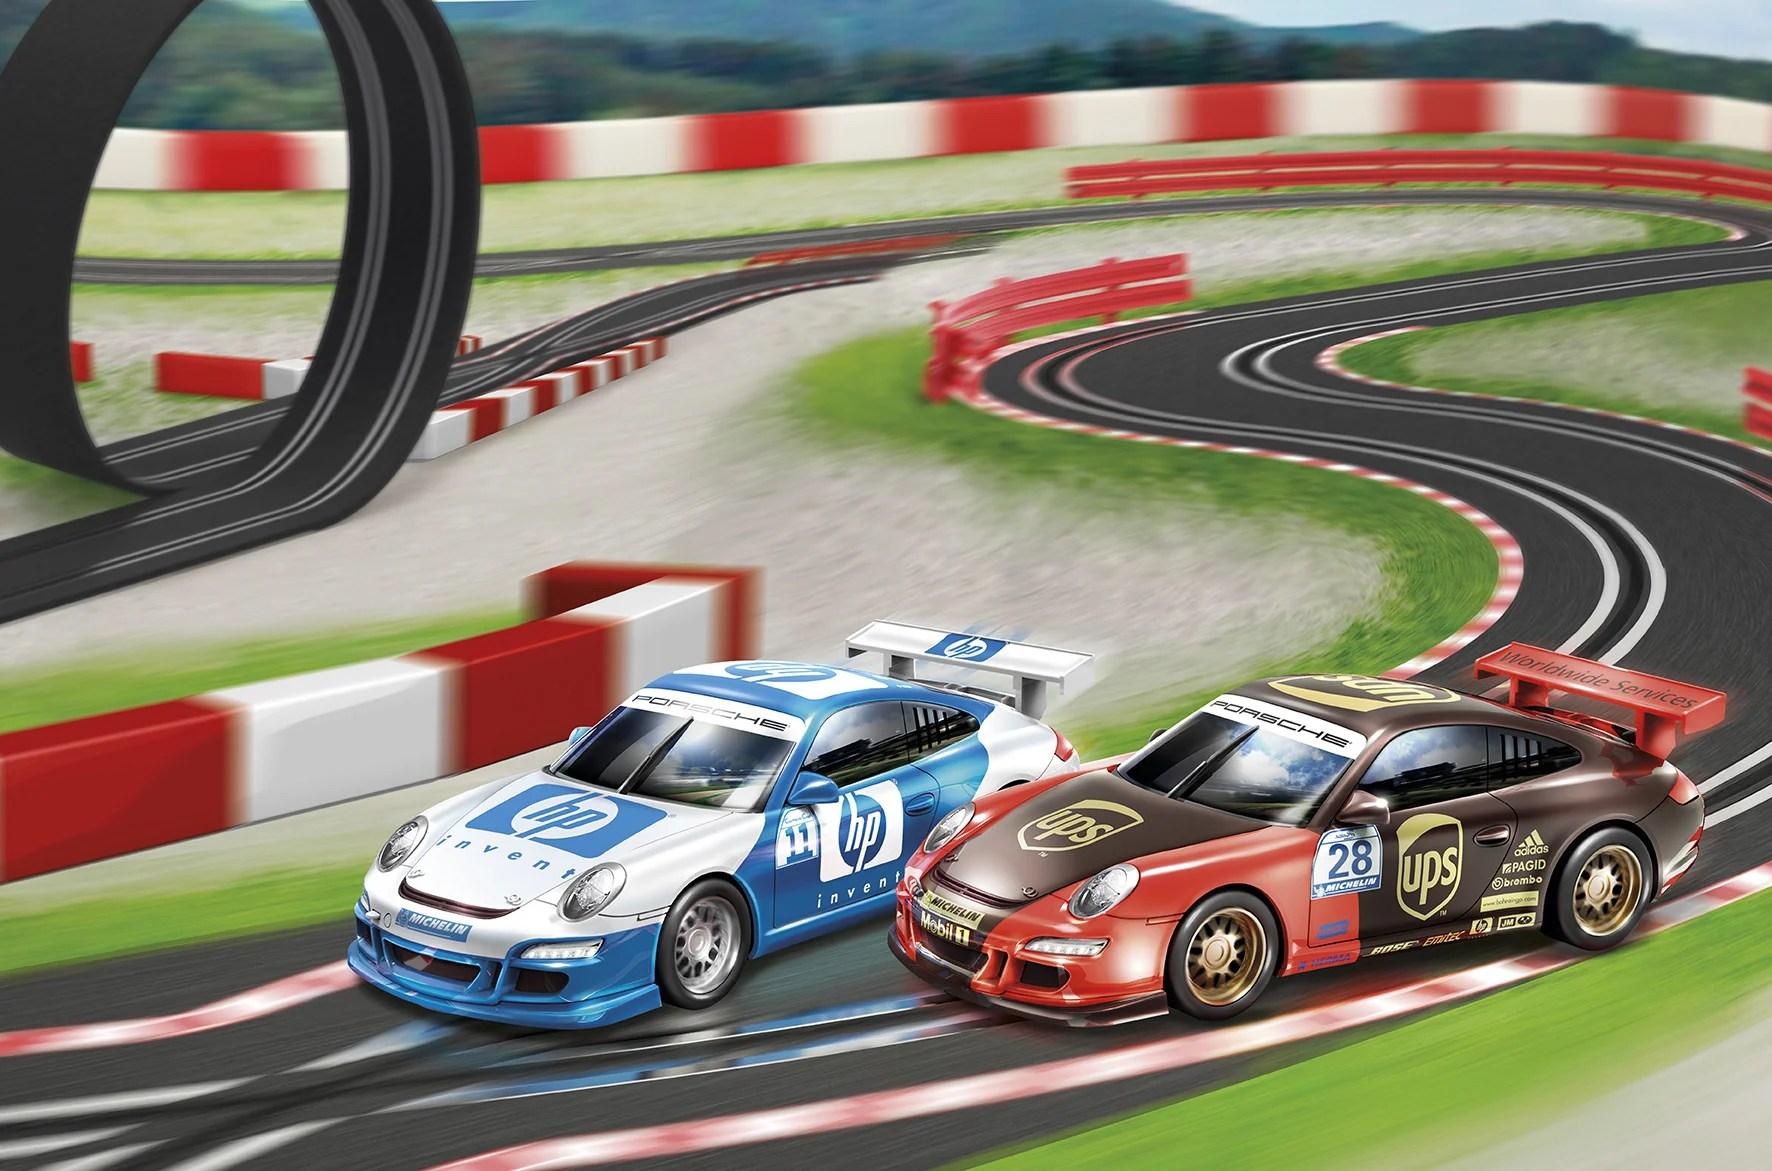 medium resolution of ho slot car racing slot car track power wiring